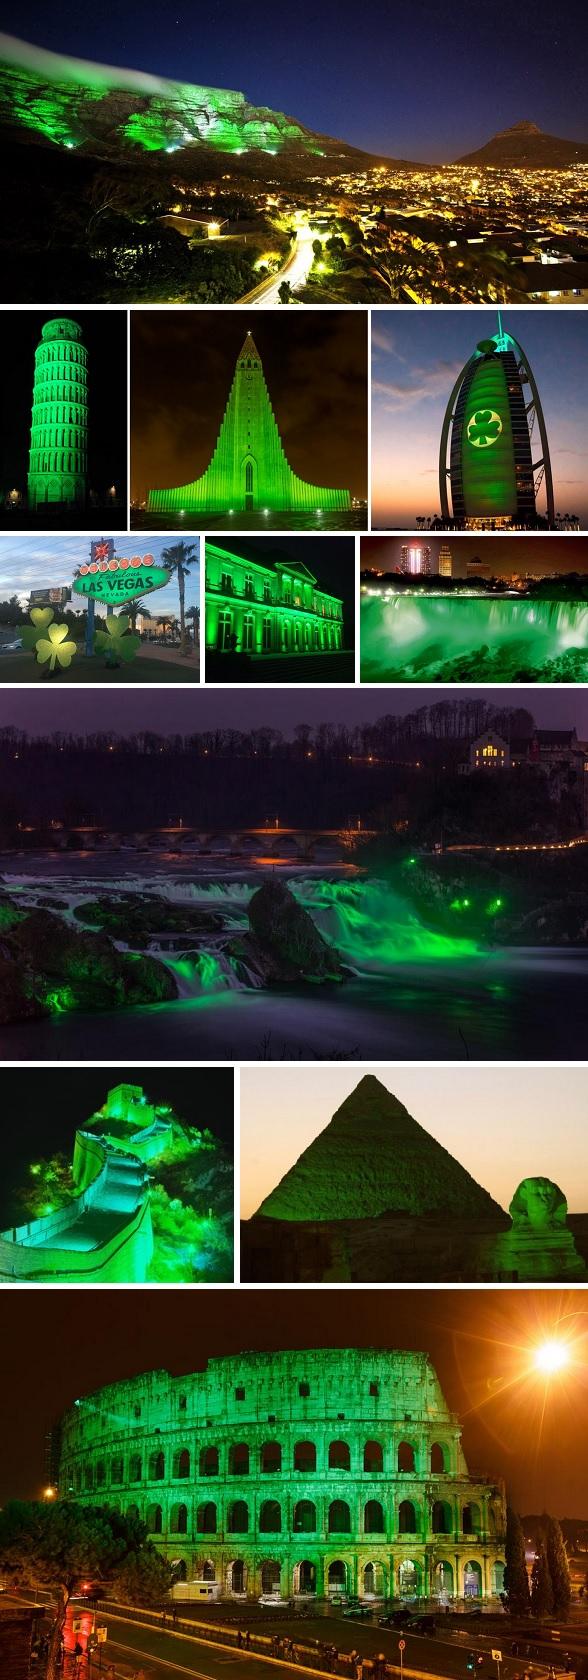 Global Greening 2015